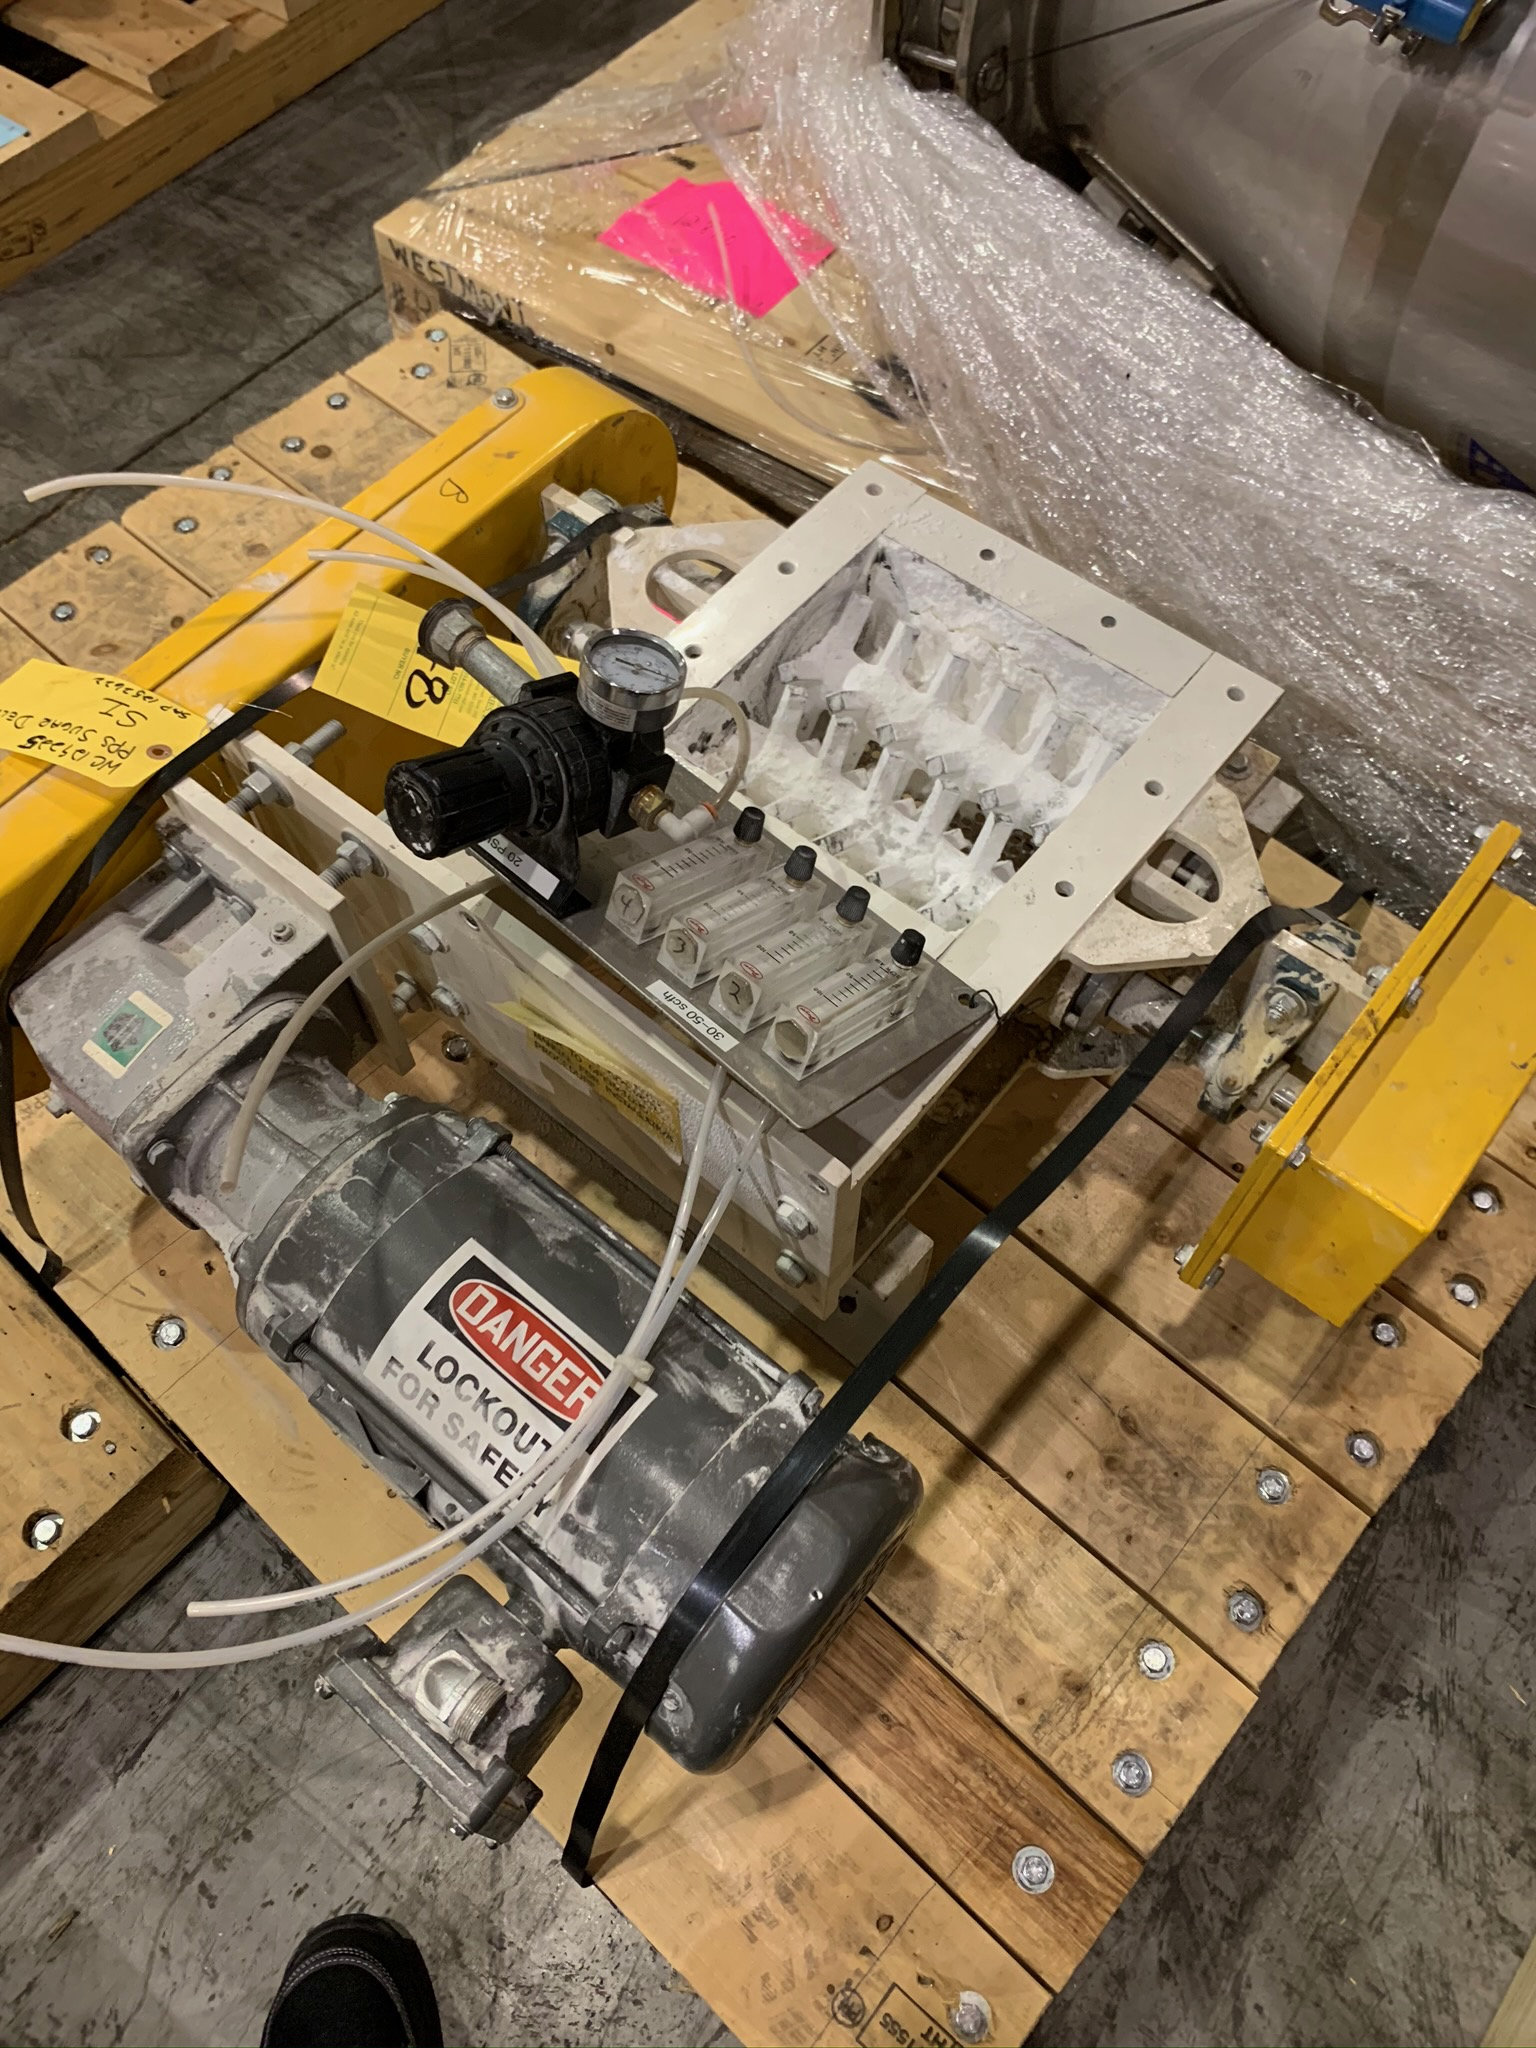 Lot 48 - PPS Sugar Delumper Model CS-99-DRL S/N 37321-2 (Rigging Fee - $50)